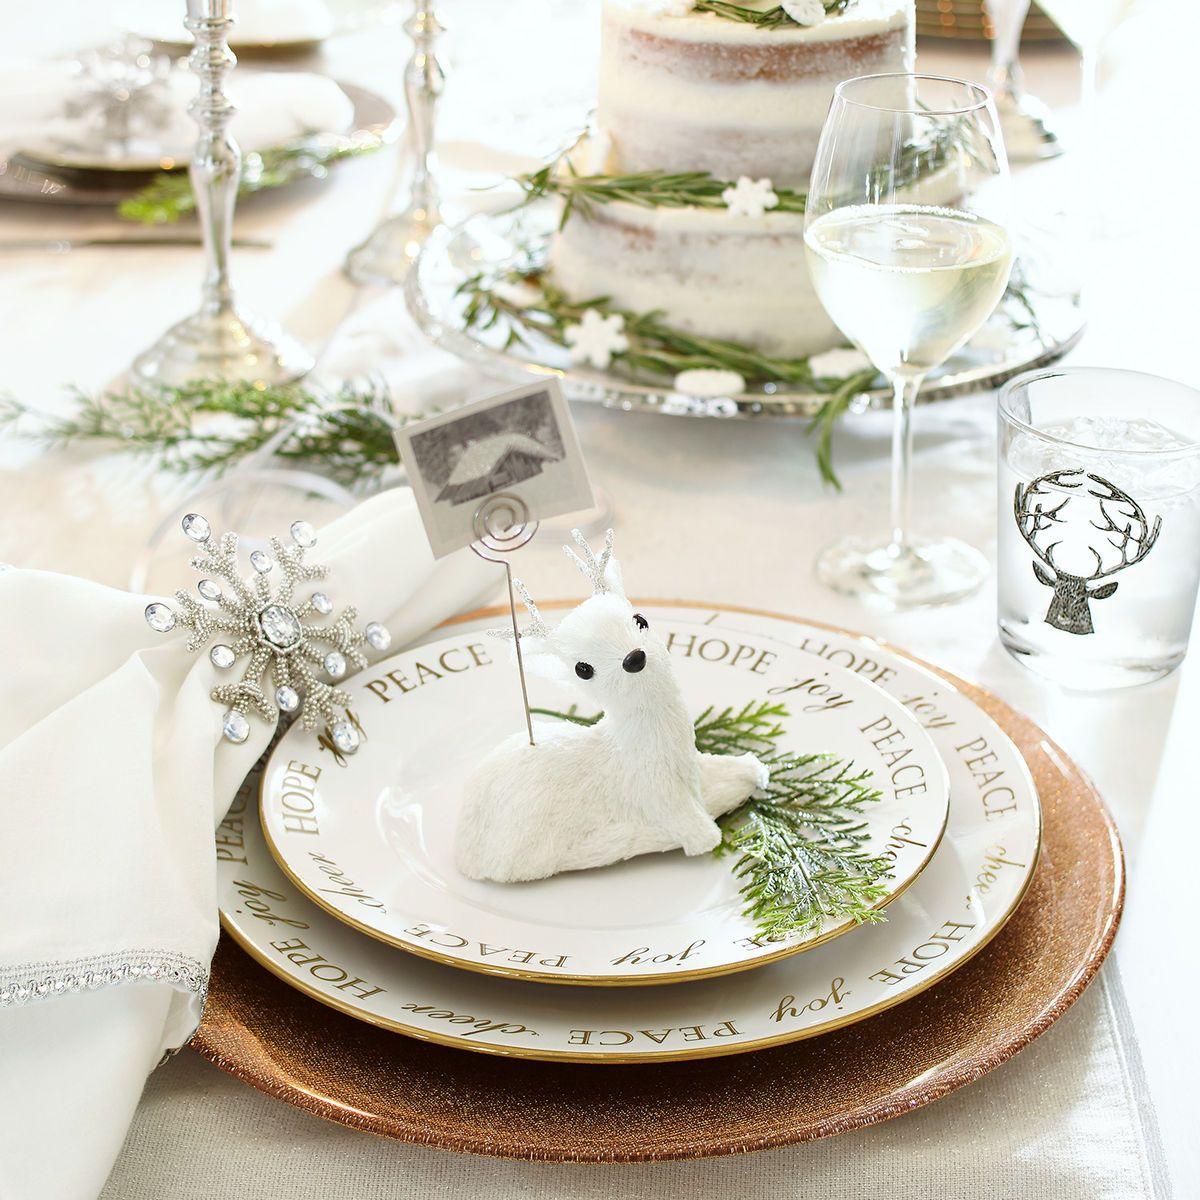 Holiday Peace u0026 Joy Porcelain Dinnerware | Pier 1 Imports & Holiday Peace u0026 Joy Porcelain Dinnerware | Pier 1 Imports ...